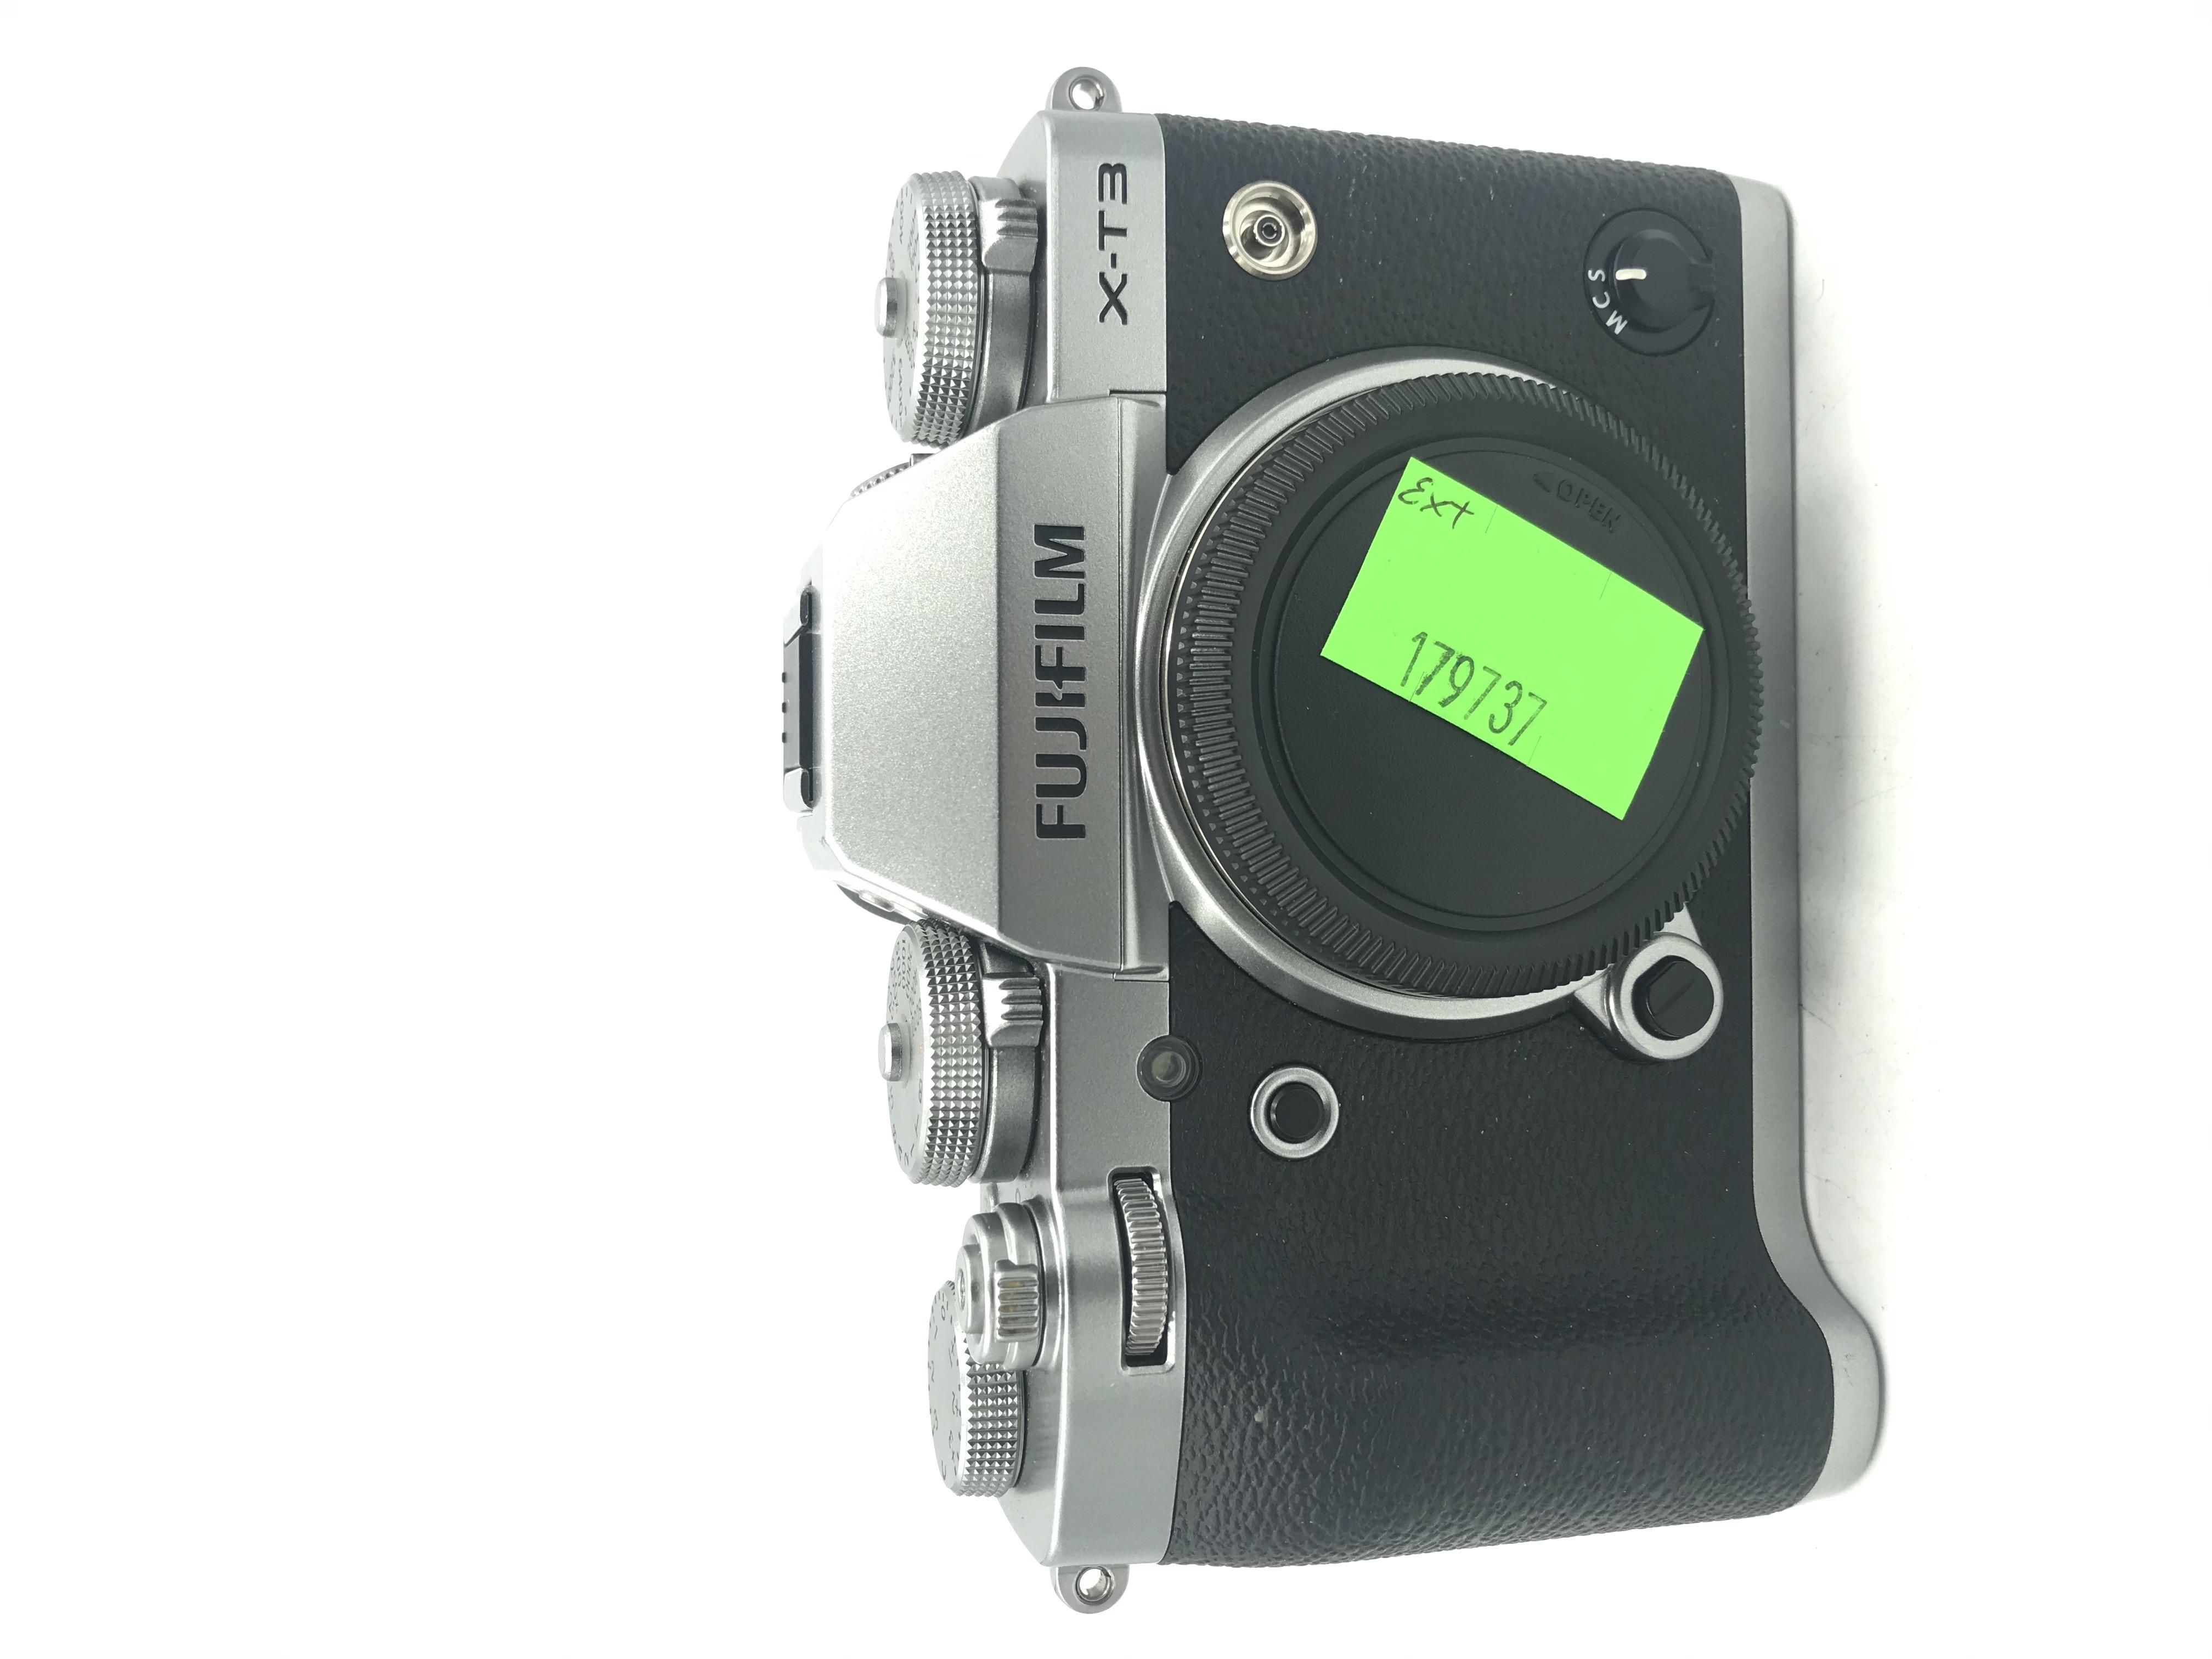 USED Fujifilm X-T3 Mirrorless Camera Body  (Silver)